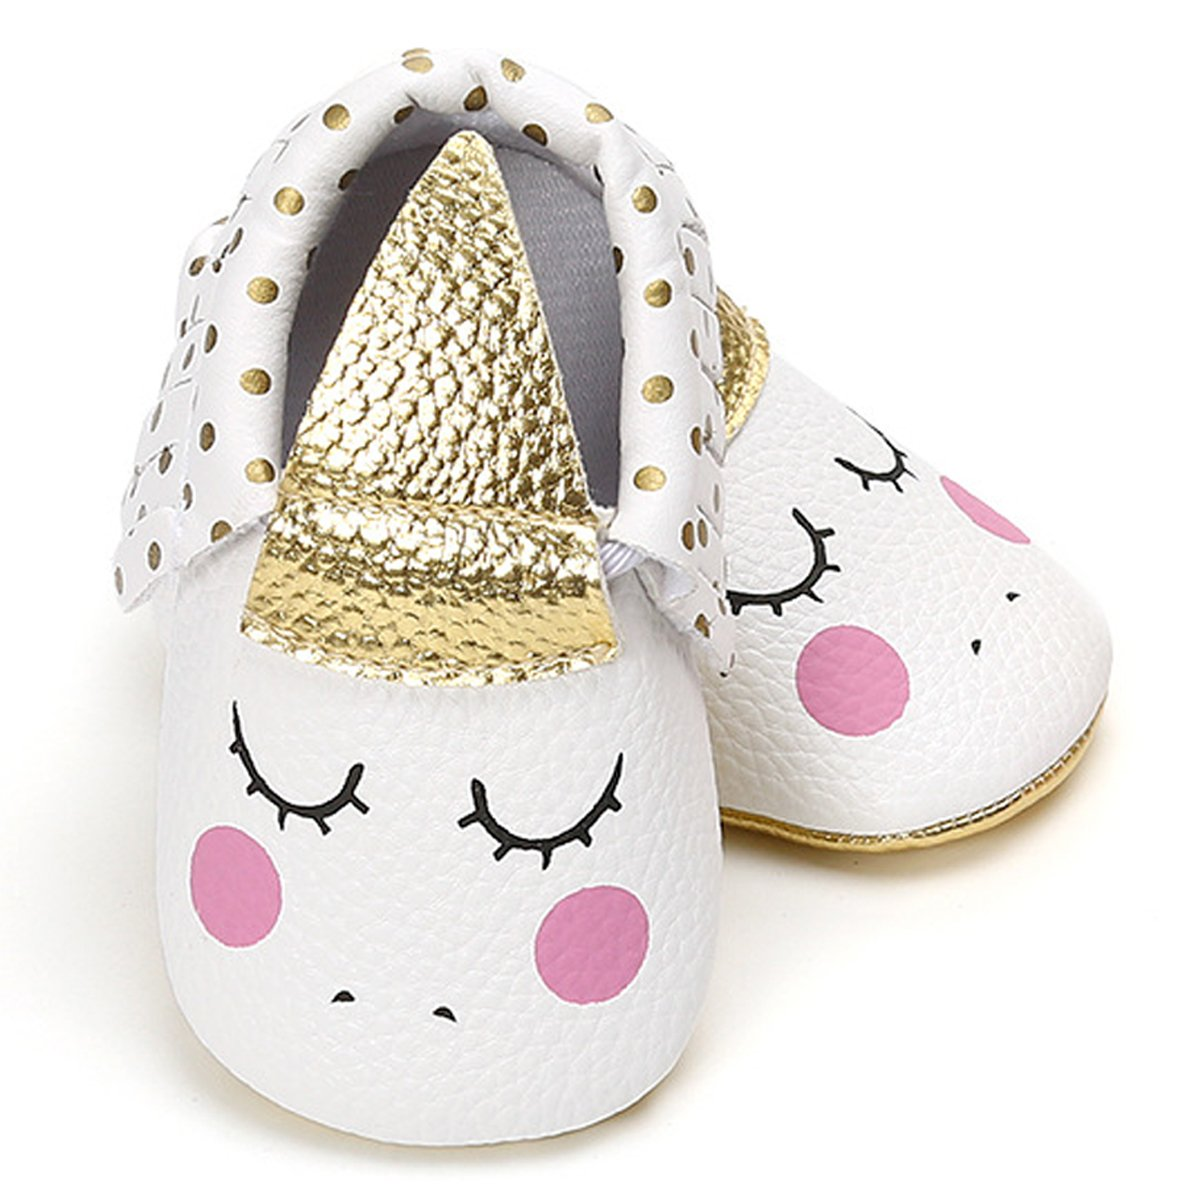 d9d7414385b7 Cake Smash Outfits Newborn Baby Girls It s My 1st Birthday Unicorn Shiny  Printed Romper Suit Sequin Dress Princess Tulle Tutu Skirt with Headband  Infant ...